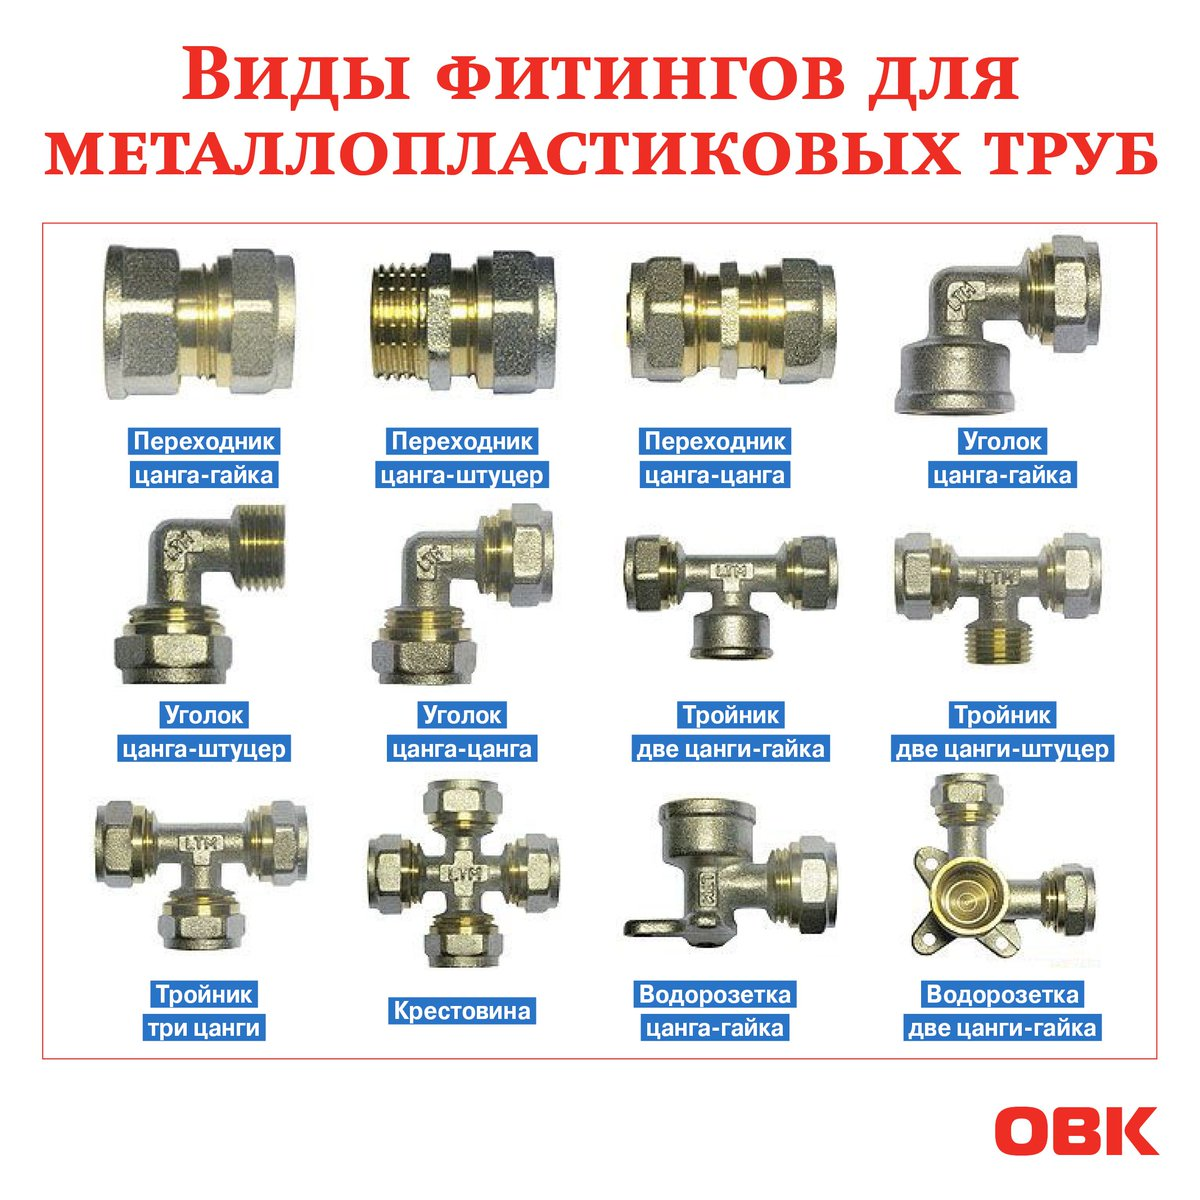 Фитинги для металлопластиковых труб: фото, монтаж